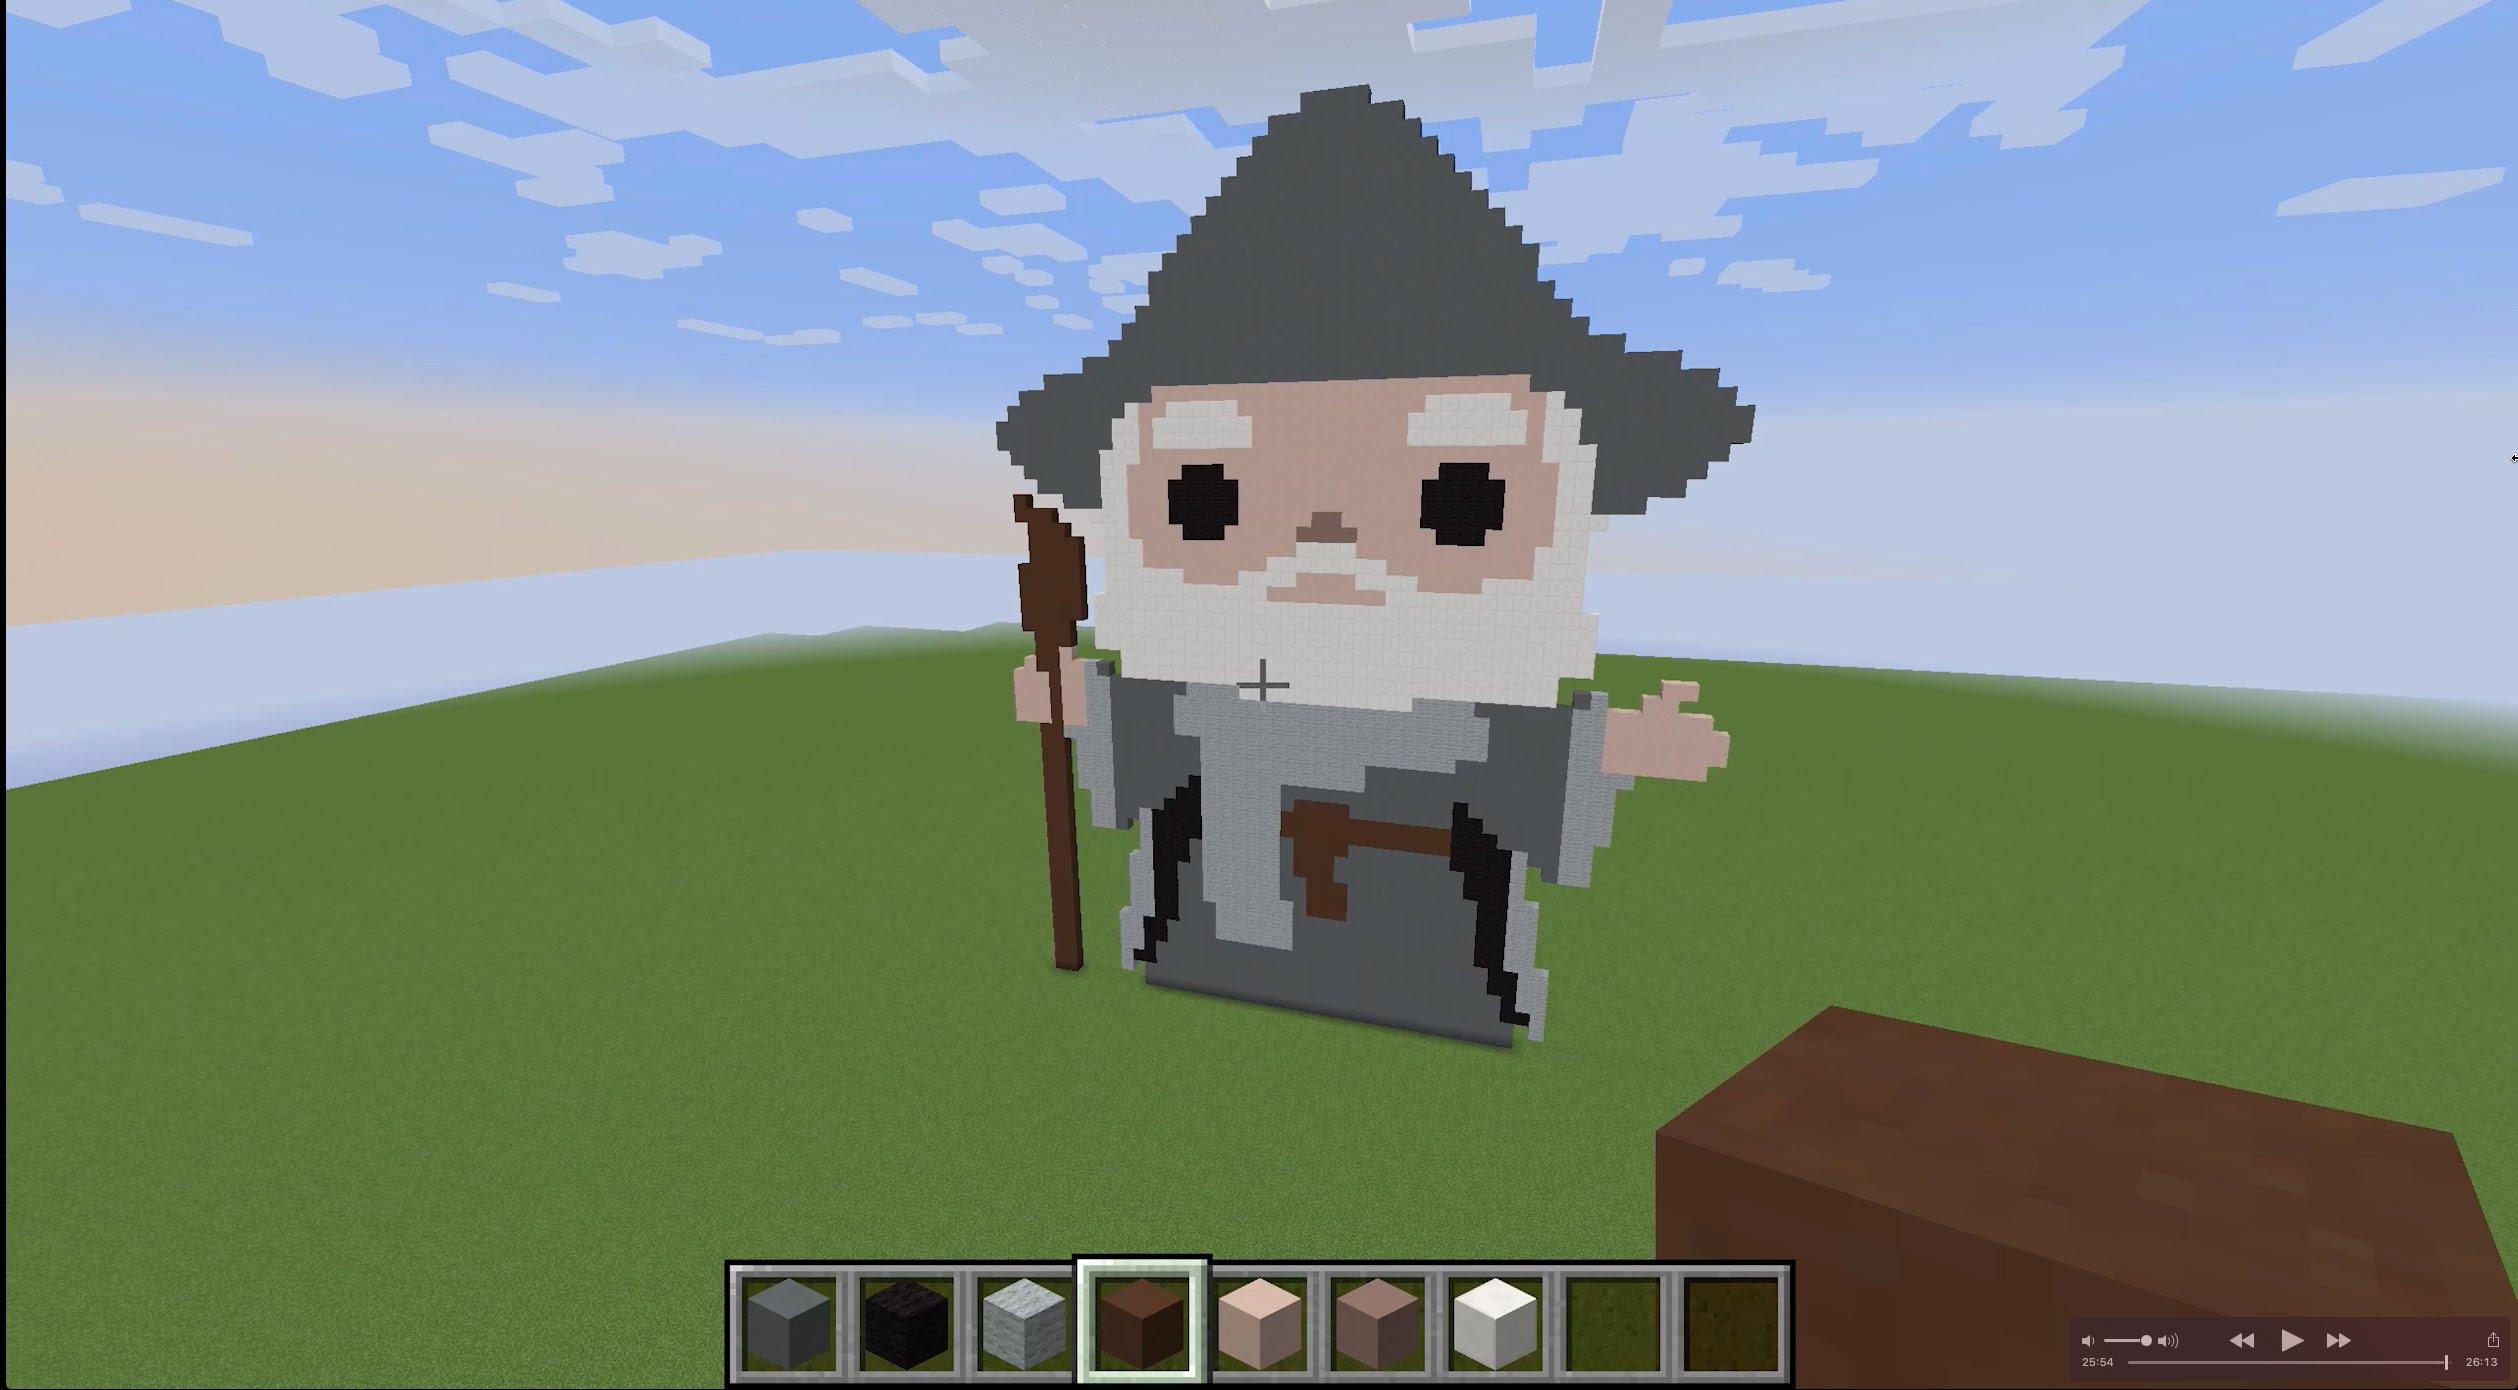 Drawn pixel art energy sword Art Pixel Gandalf Gandalf YouTube